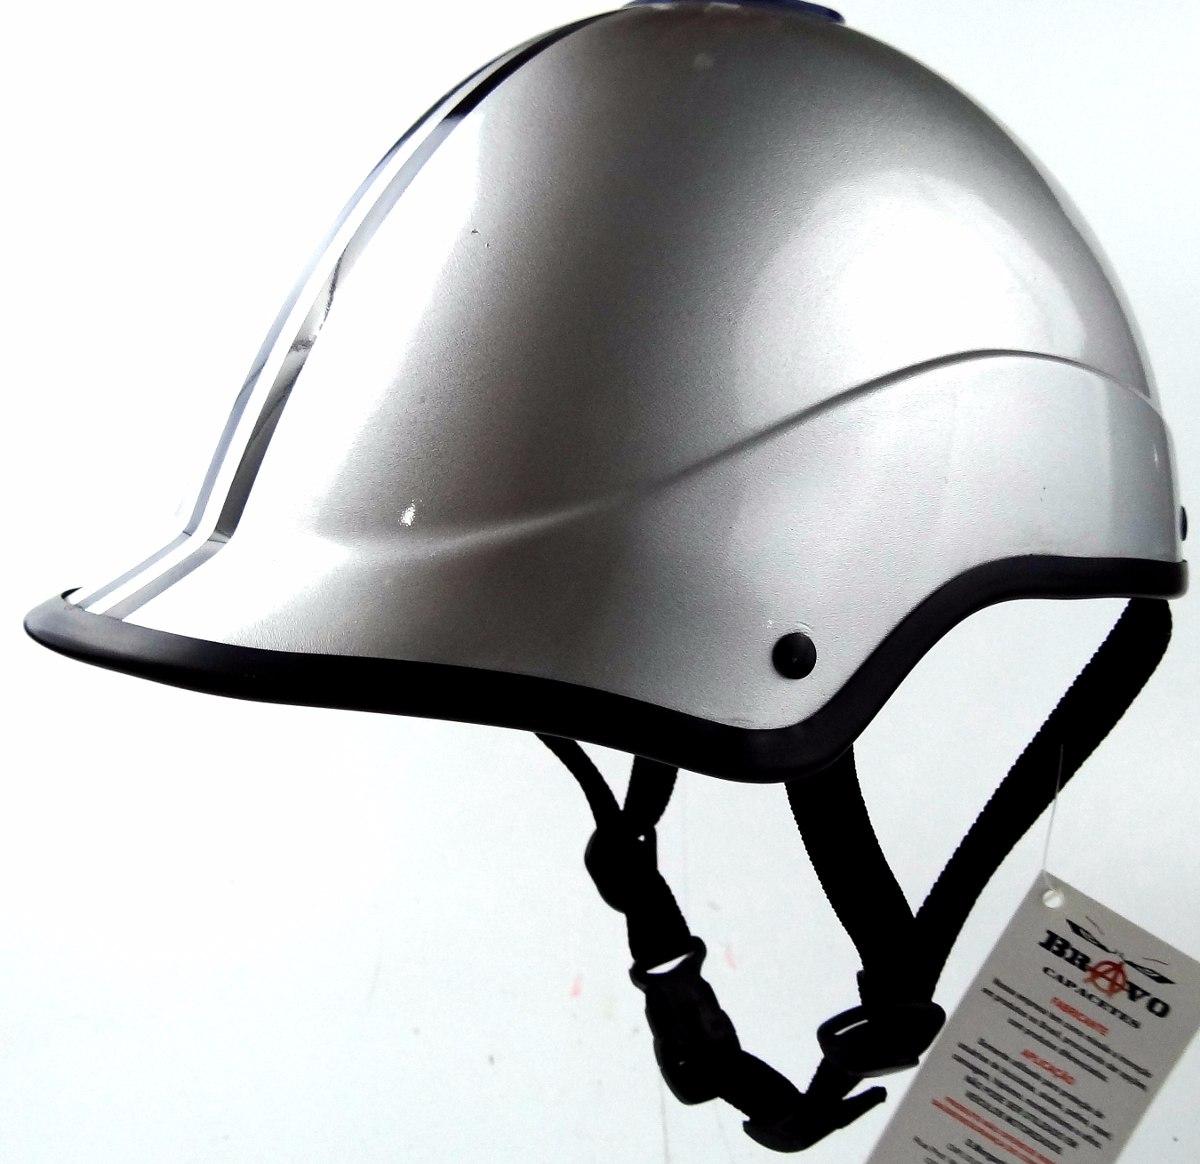 capacete bravo vintage skate bike patins roller. Carregando zoom. b61b1049561